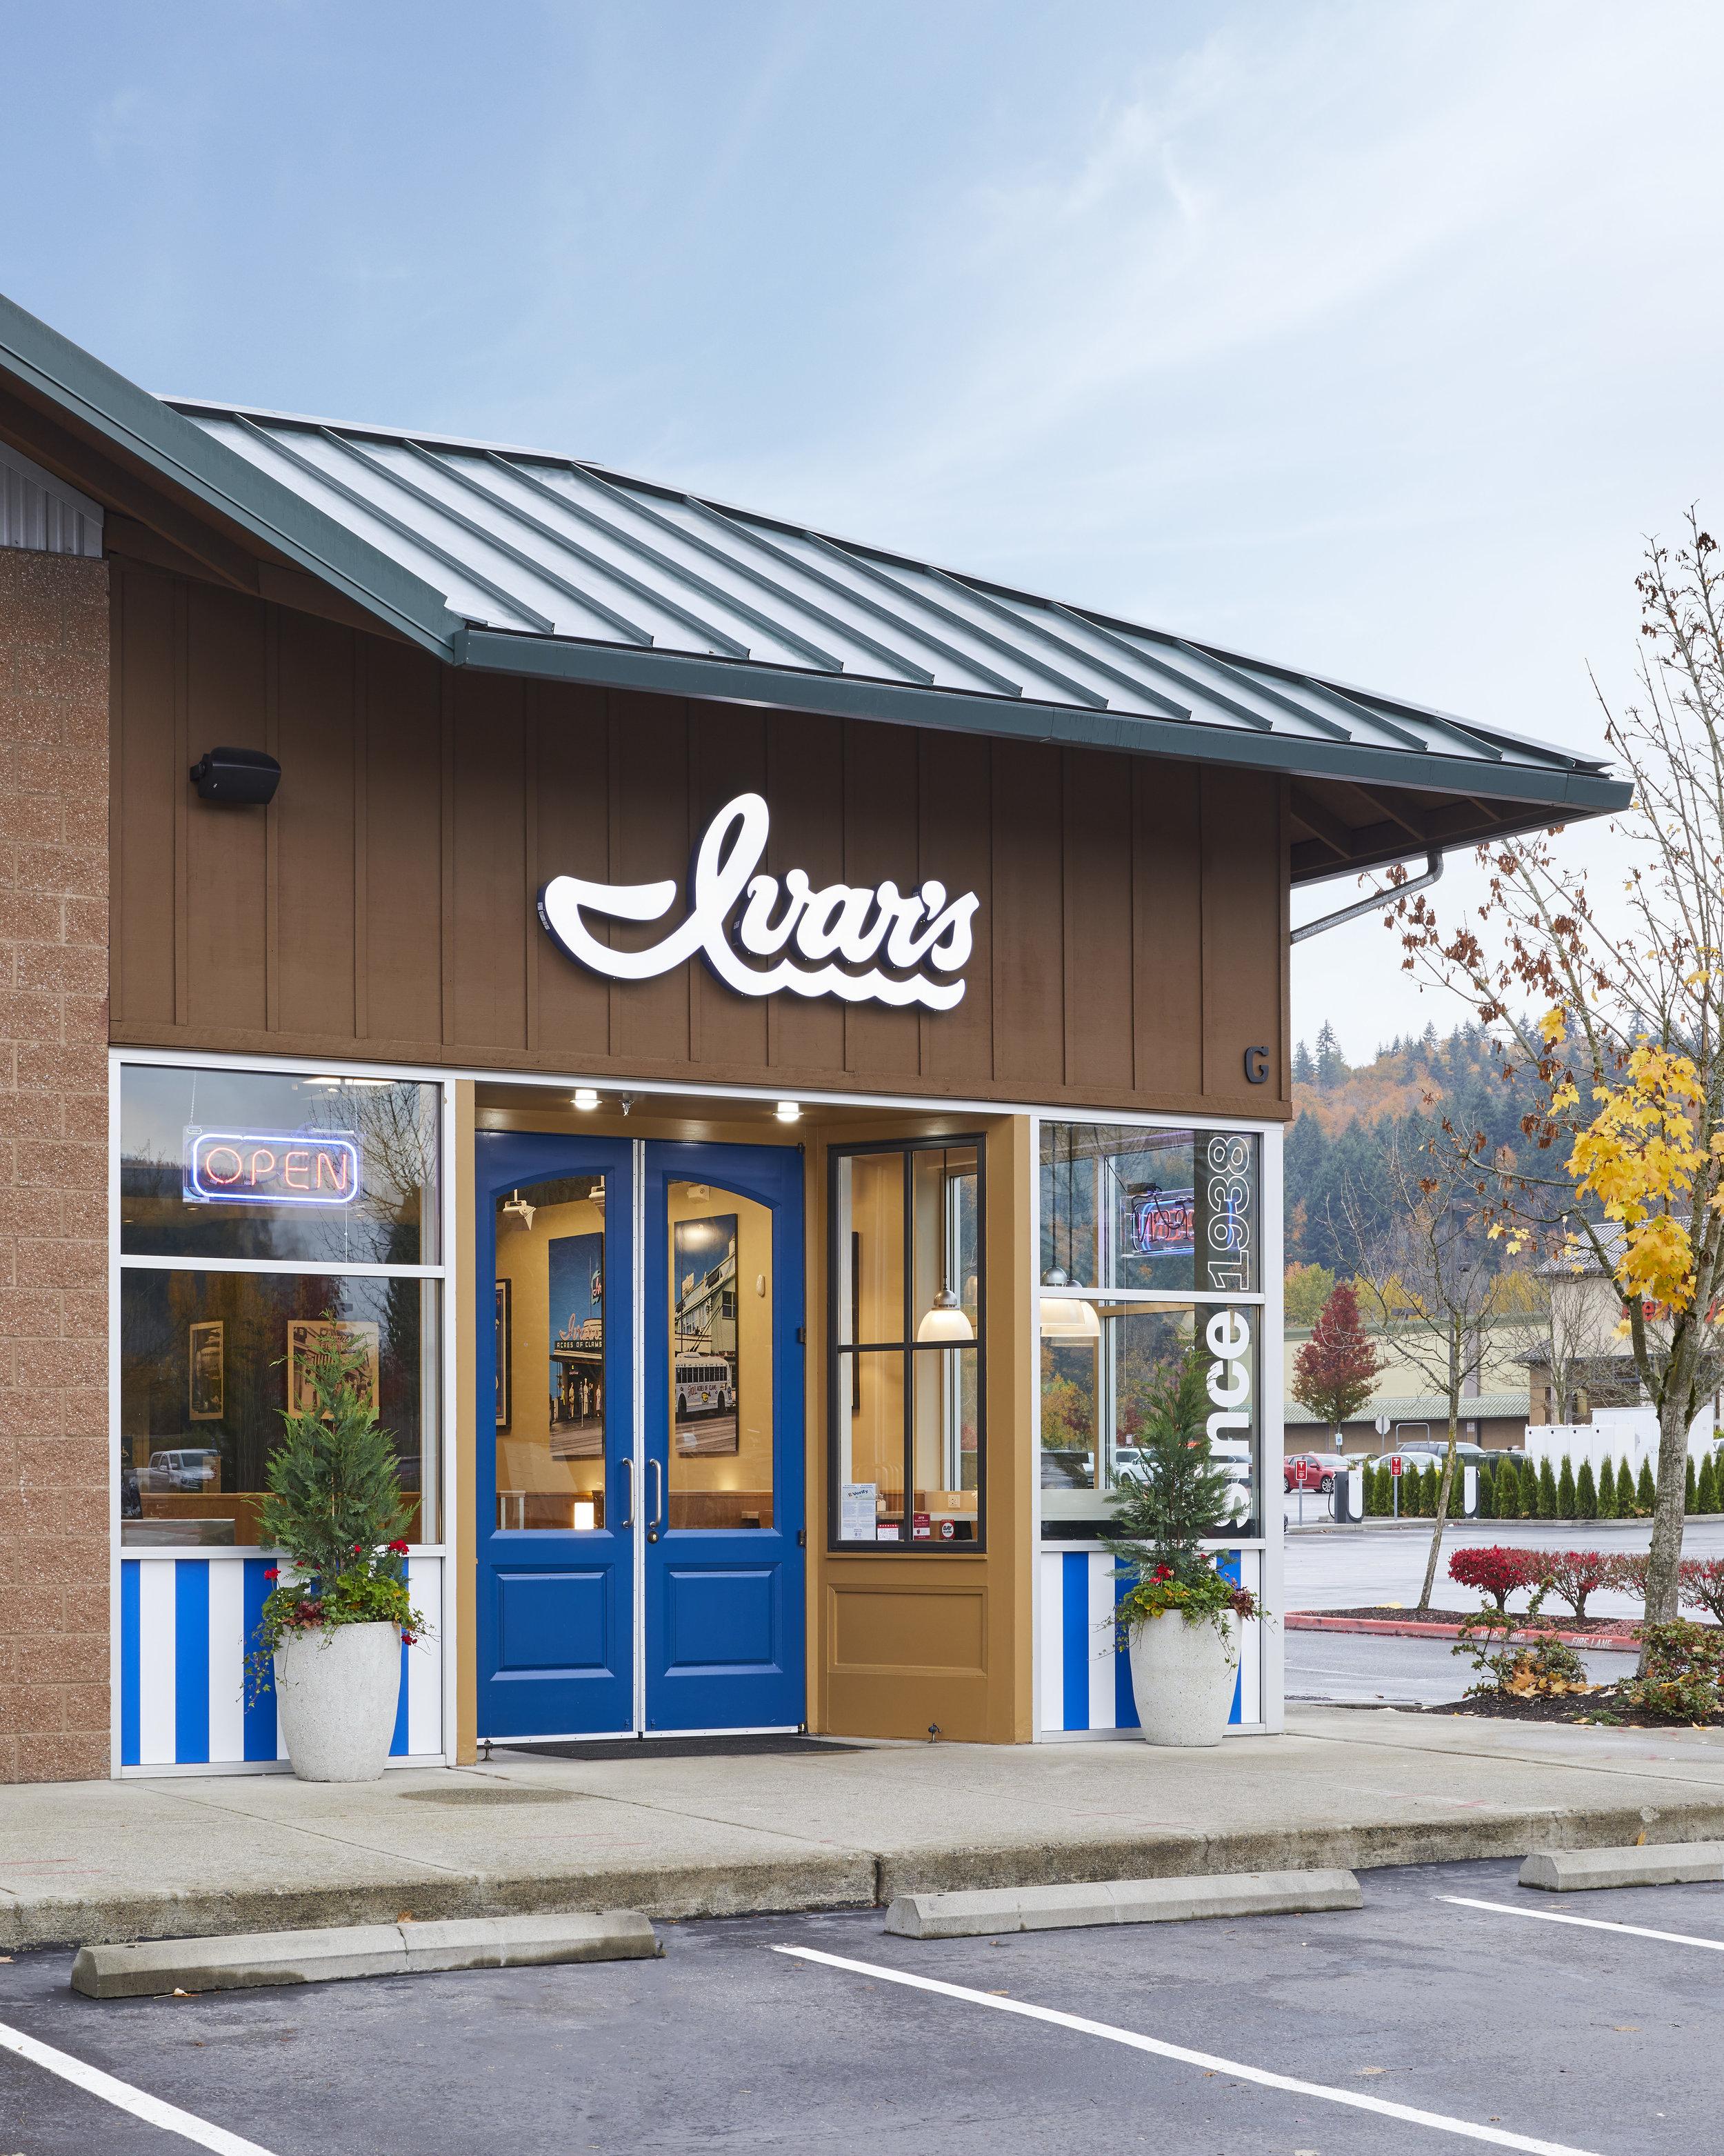 Ivar's Seafood Bar, Issaquah, WA